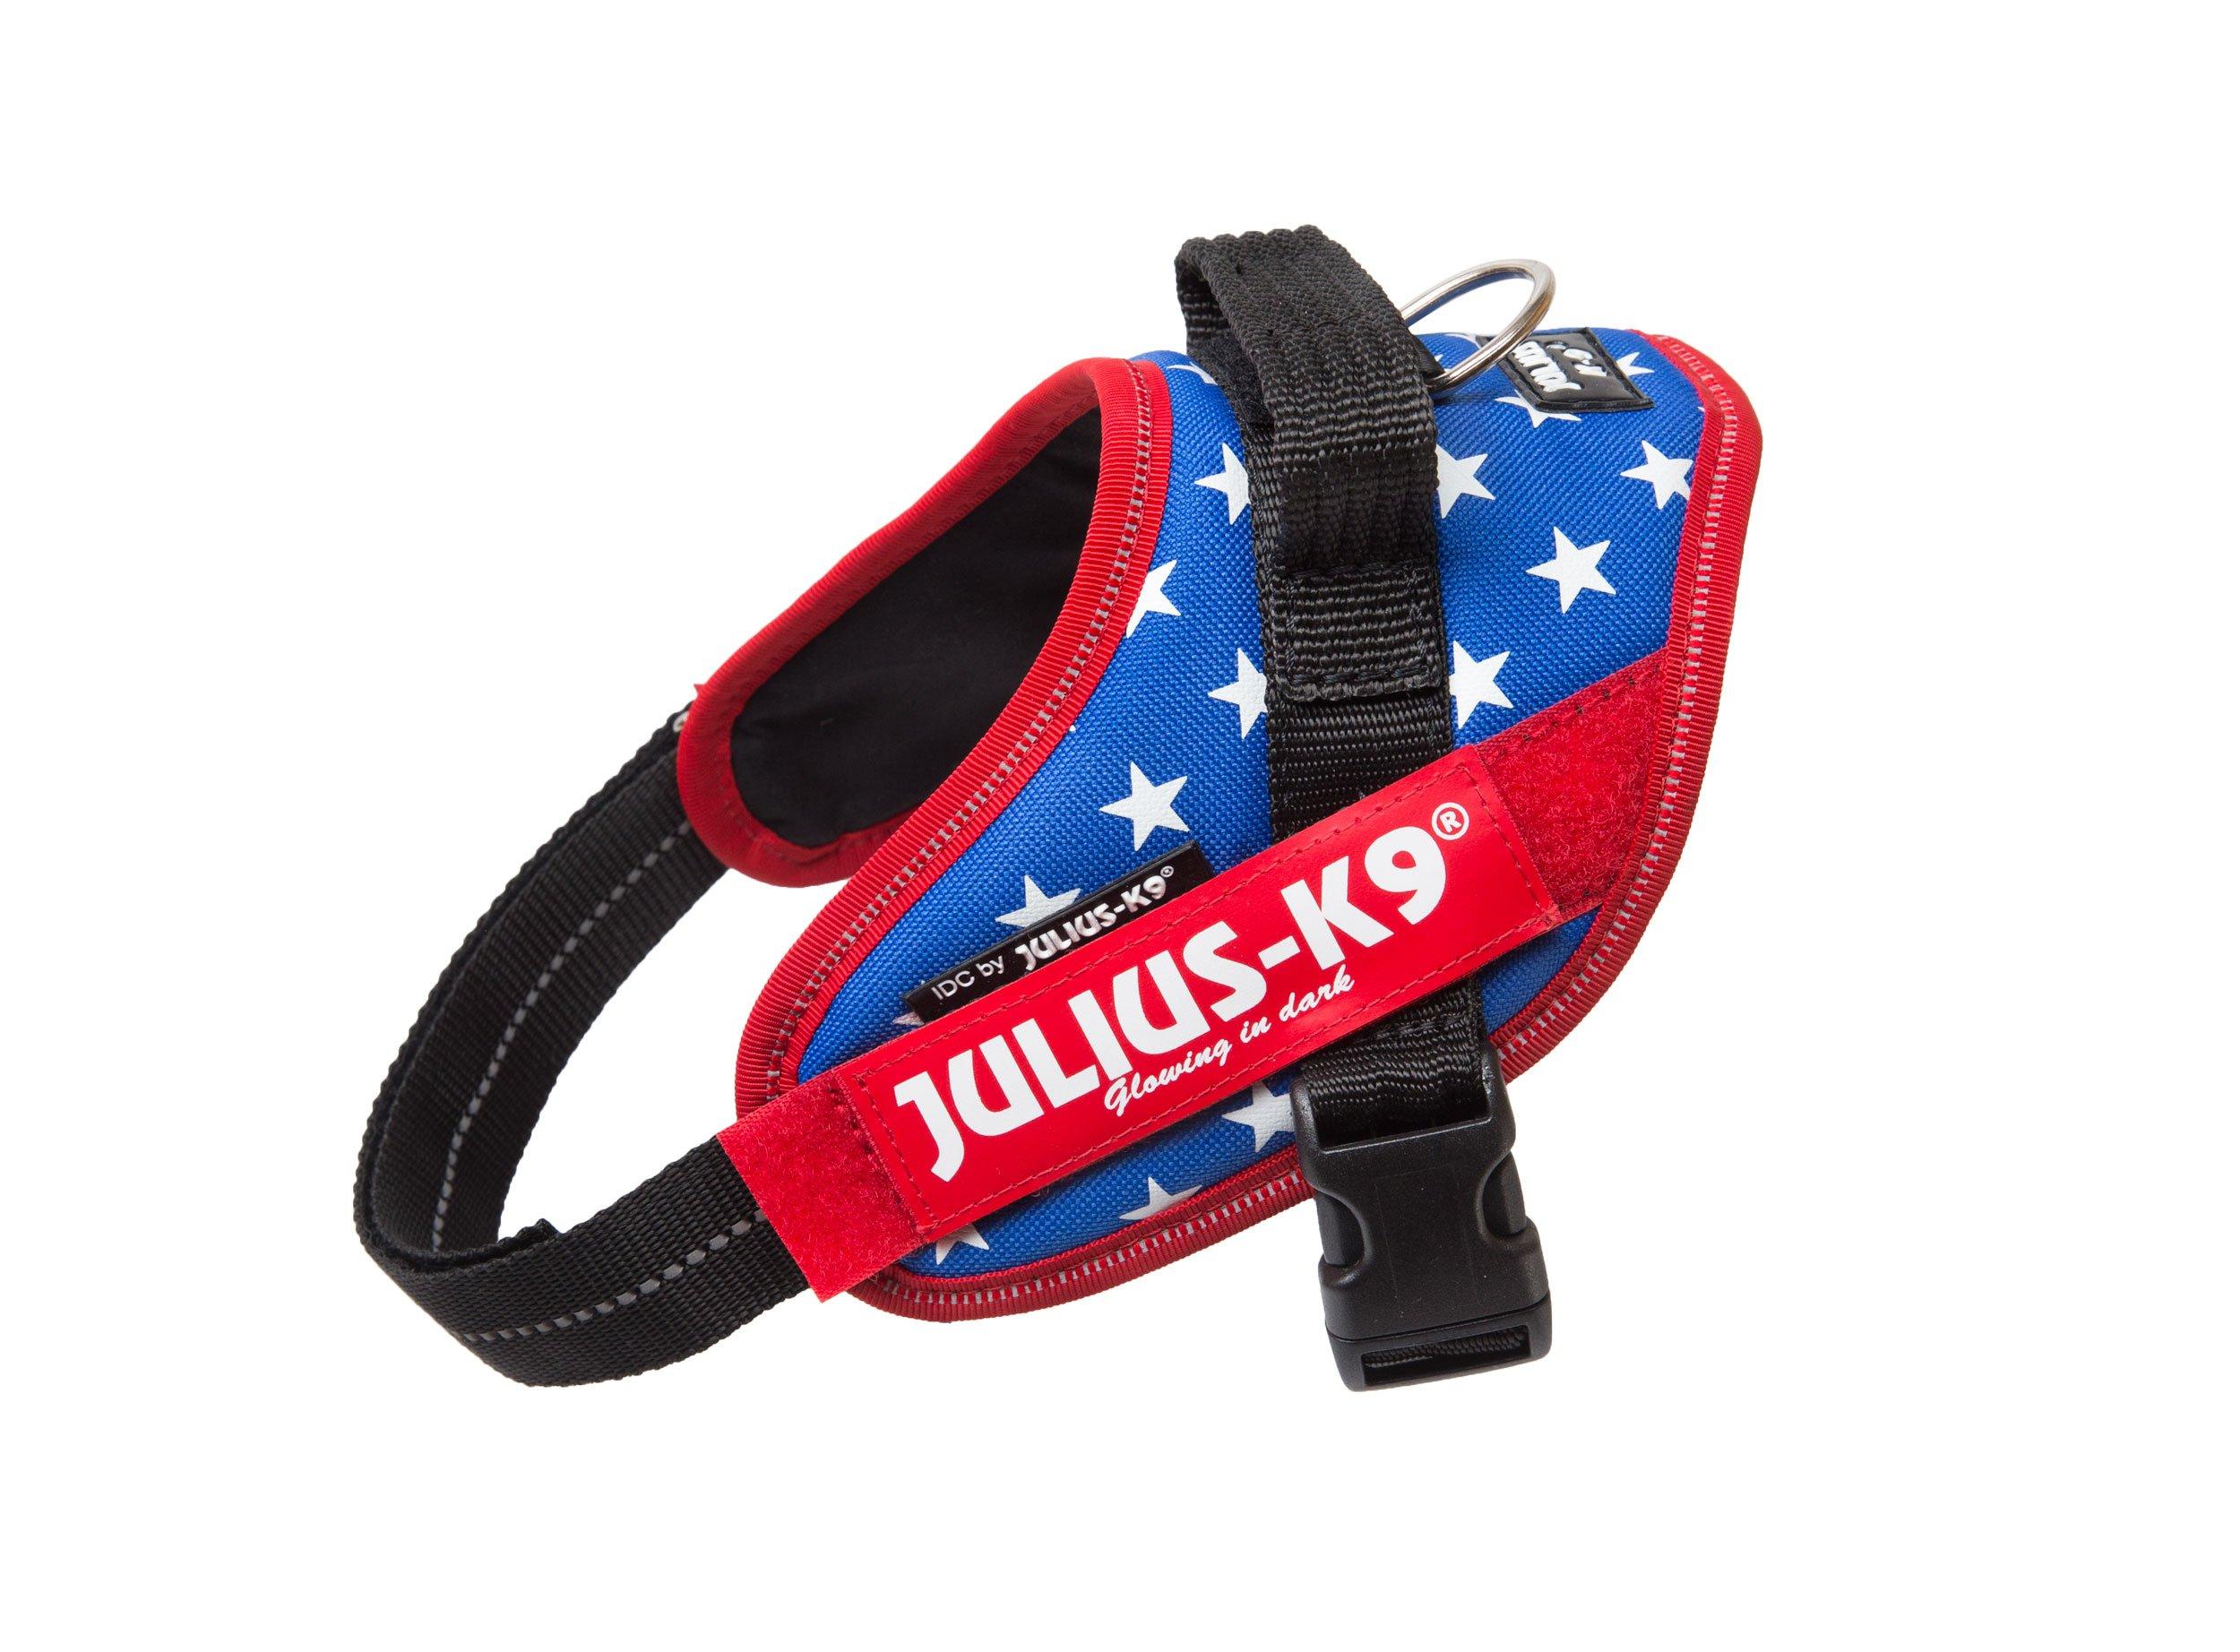 Julius-K9 IDC-Power Harness with Illuminated Velcro Patches, Ameri-Canis, Size: Mini/49-67 cm